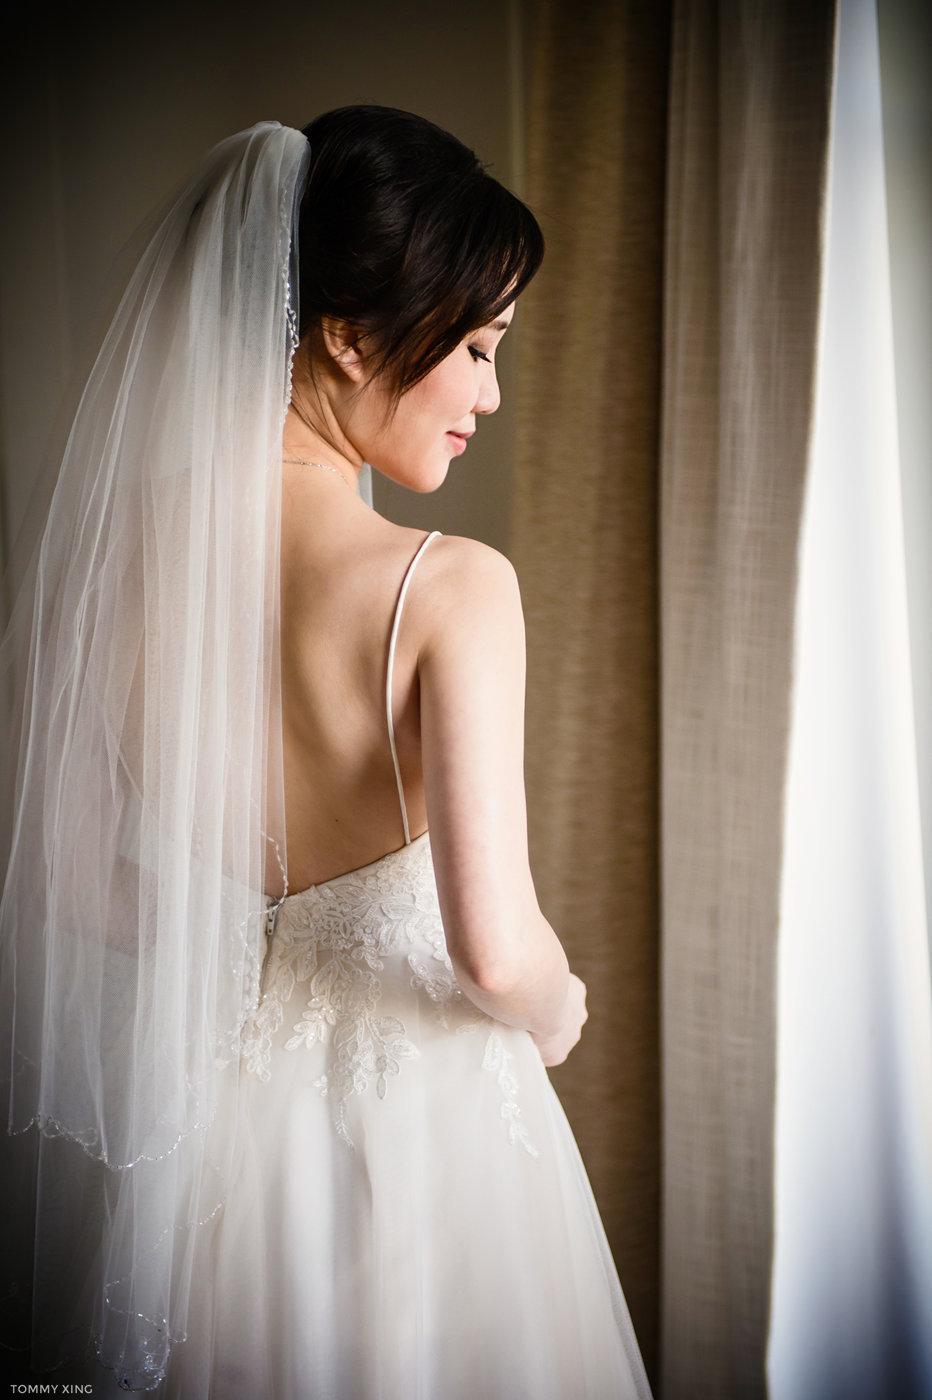 Edith Ho & Ryan Tan Ritz Carlton Half Moon Bay Wedding 旧金山湾区半月湾丽思卡尔顿婚礼 Tommy Xing Photography 06.jpg